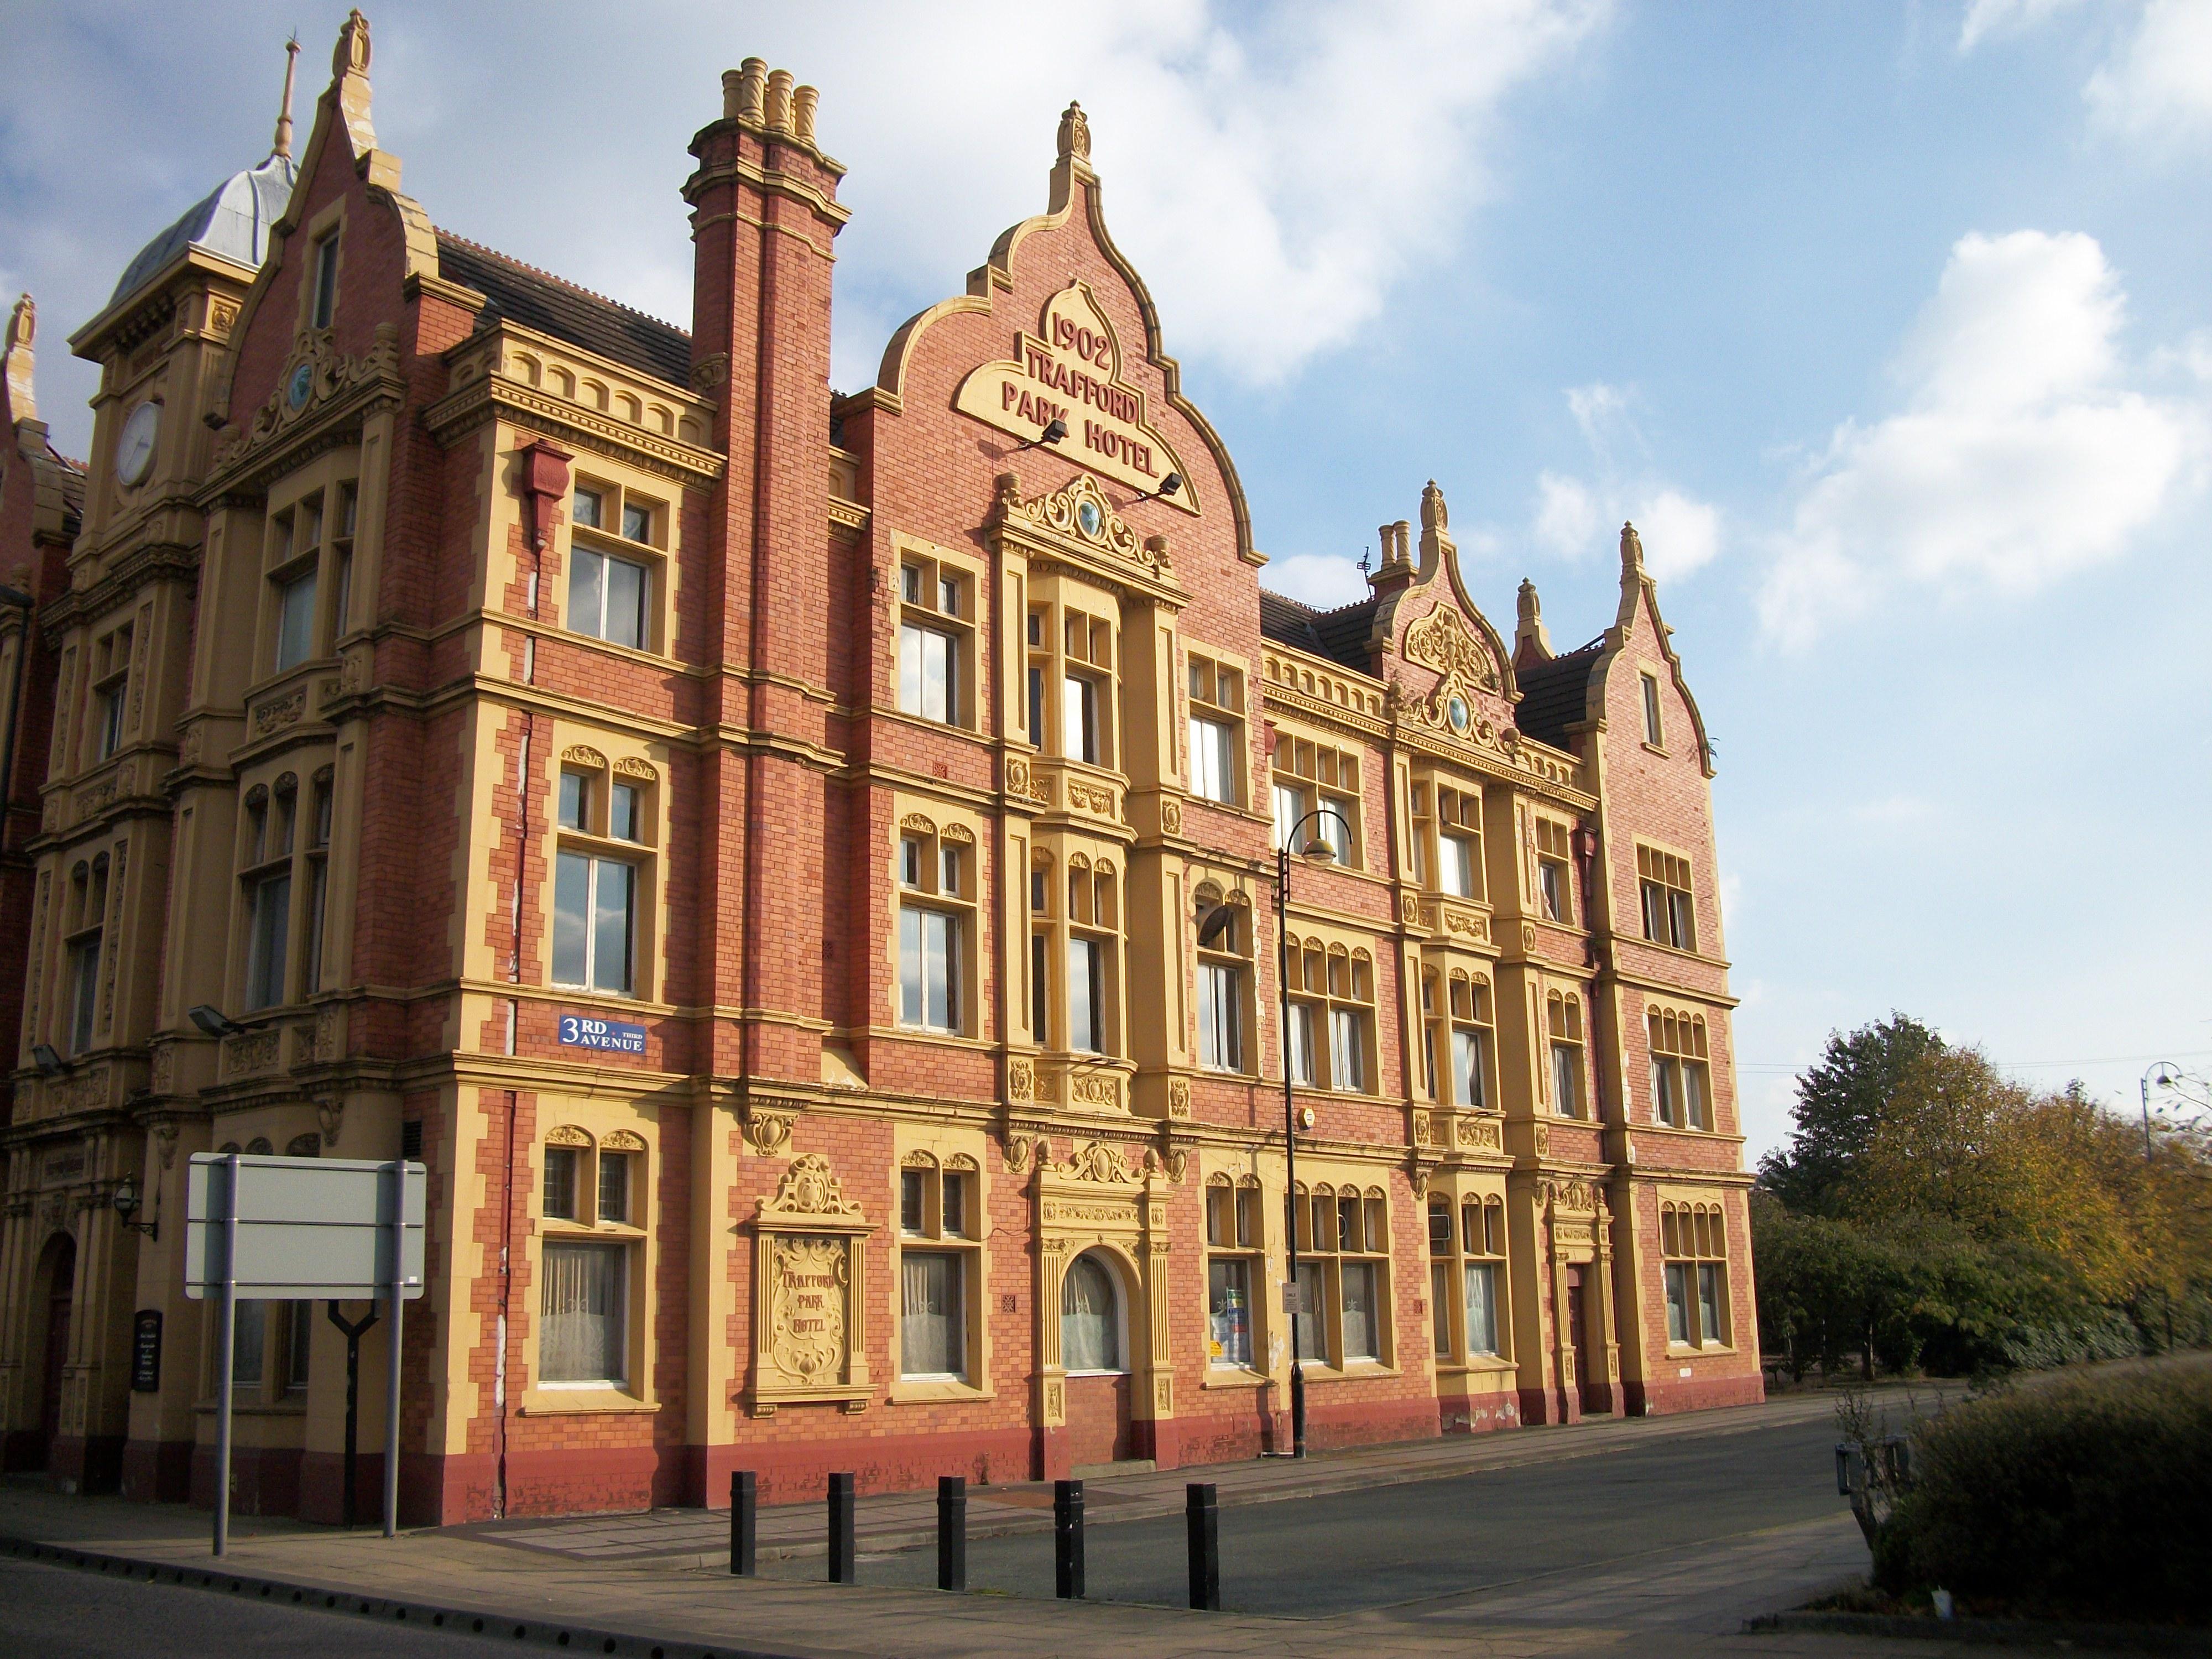 Trafford Park Hotel Building Sold